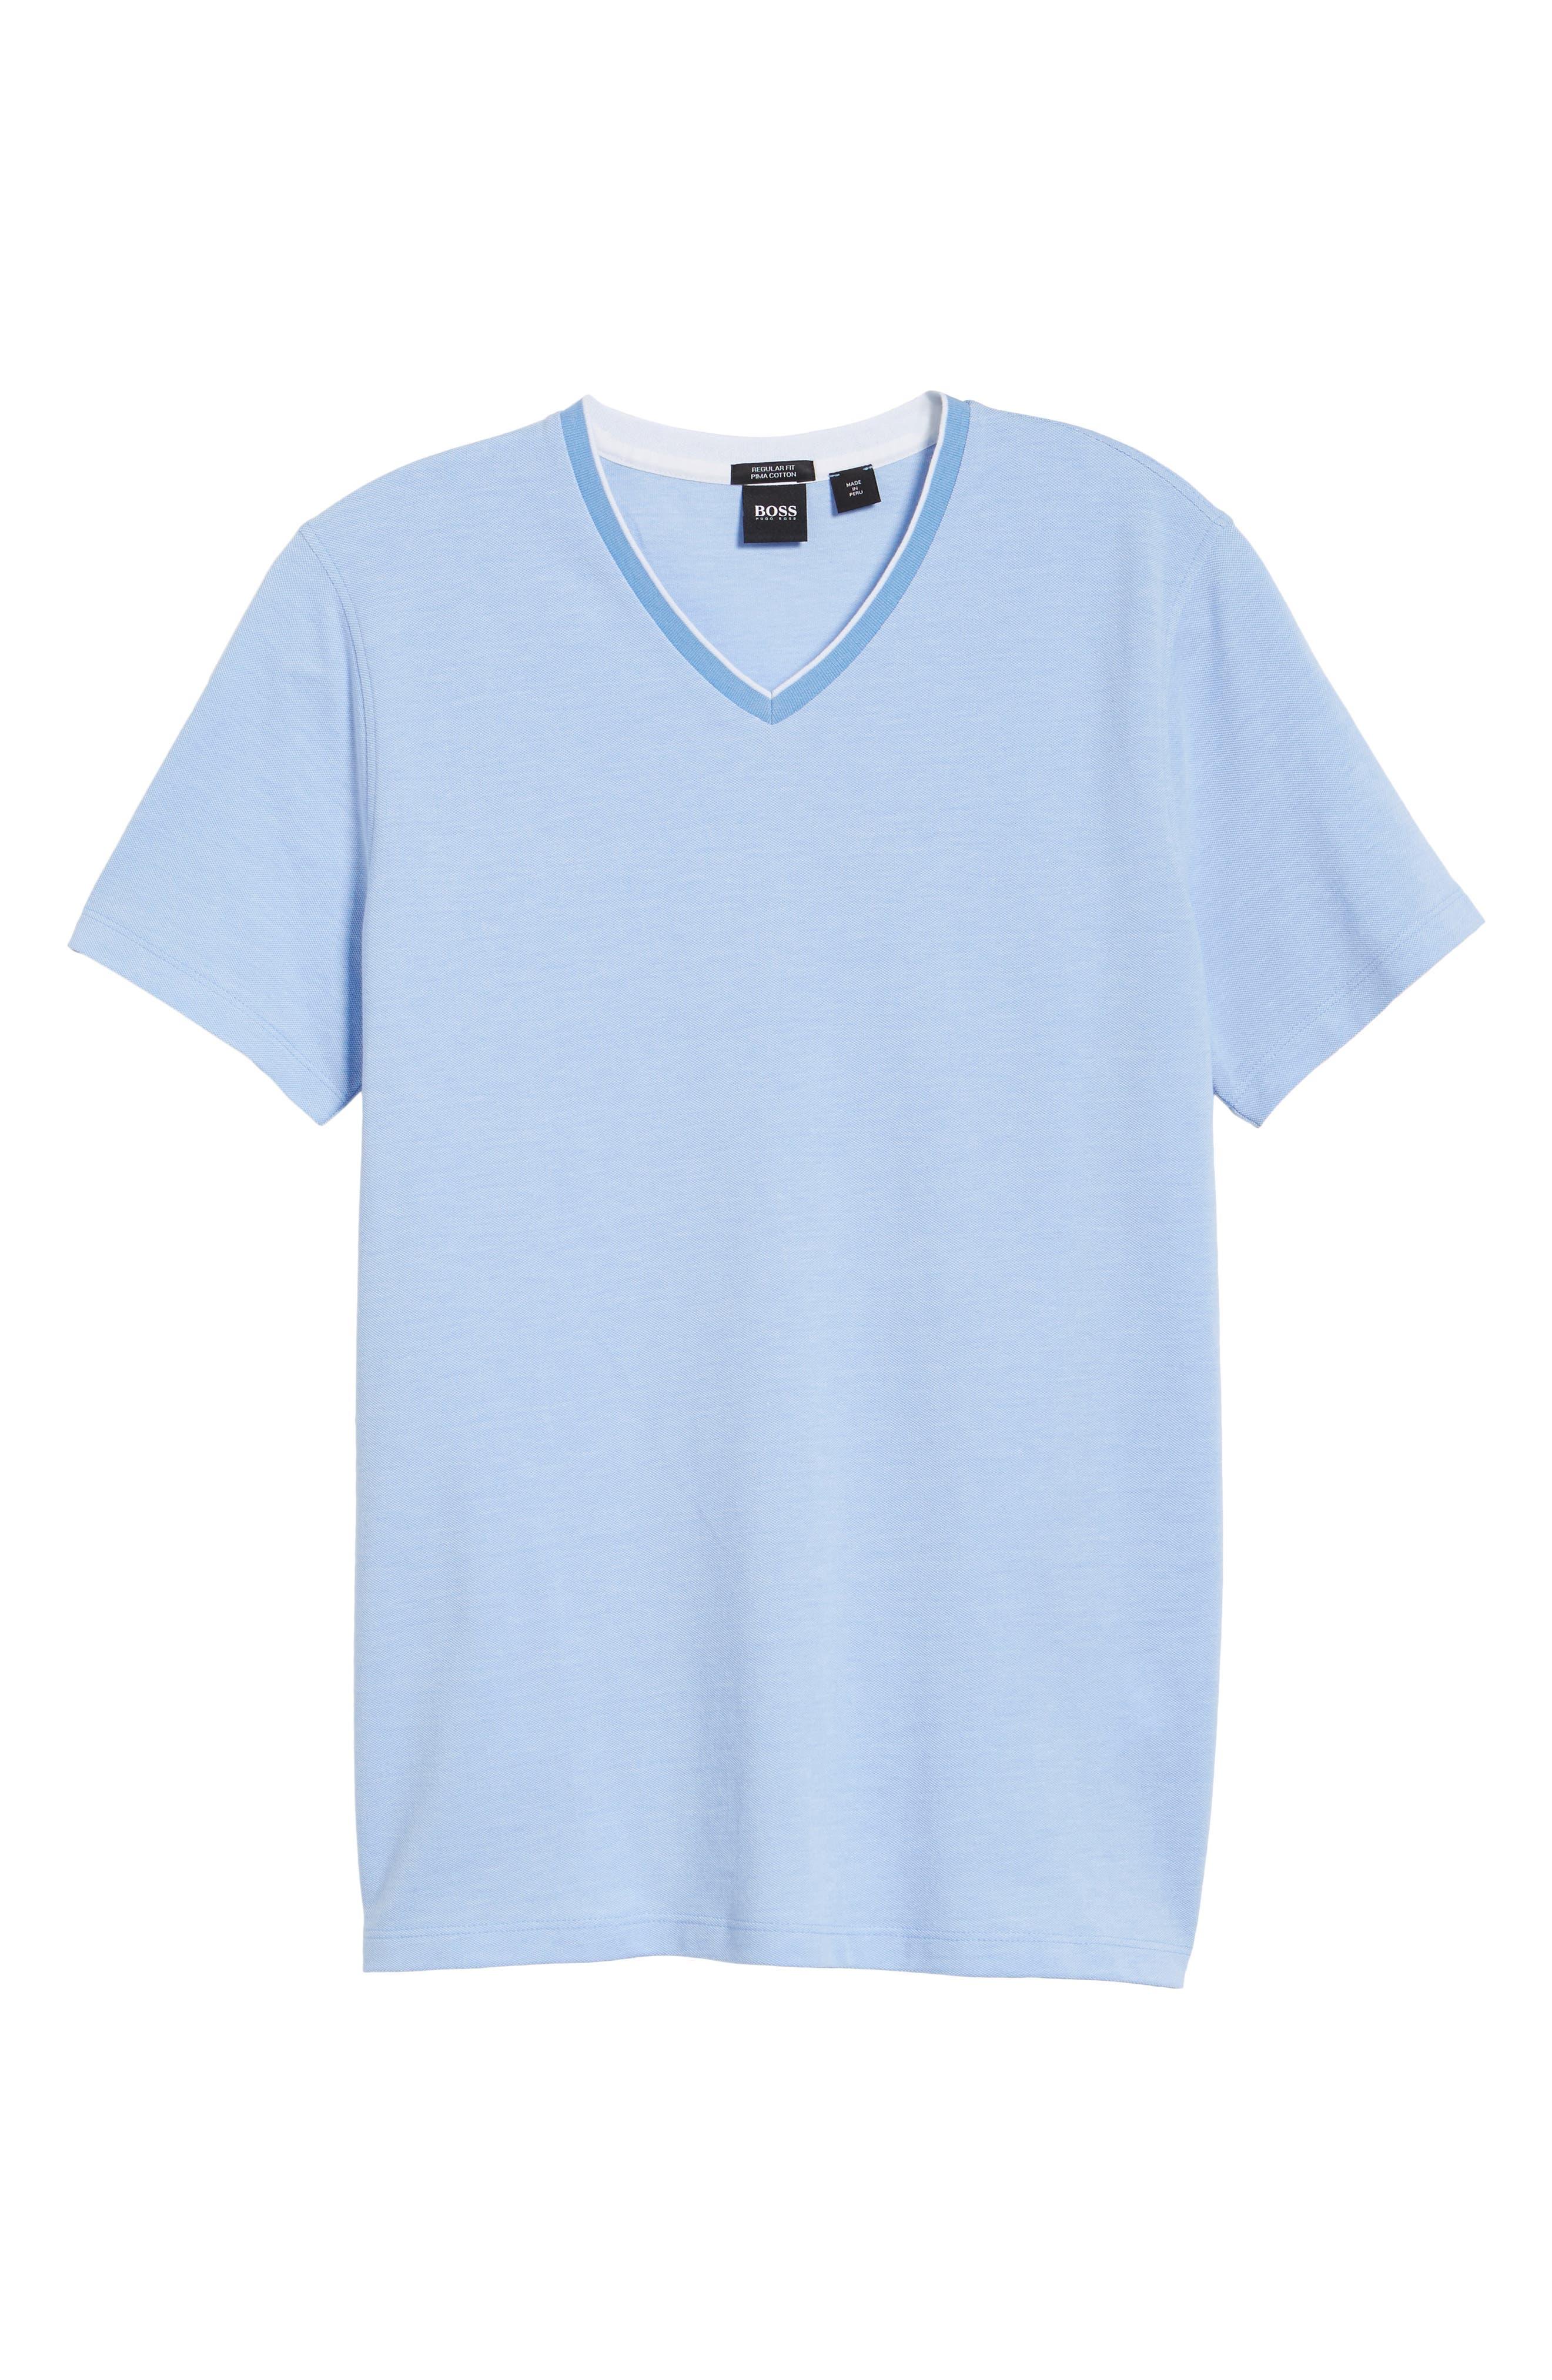 Tilson Slim Fit V-Neck T-Shirt,                             Alternate thumbnail 6, color,                             Blue